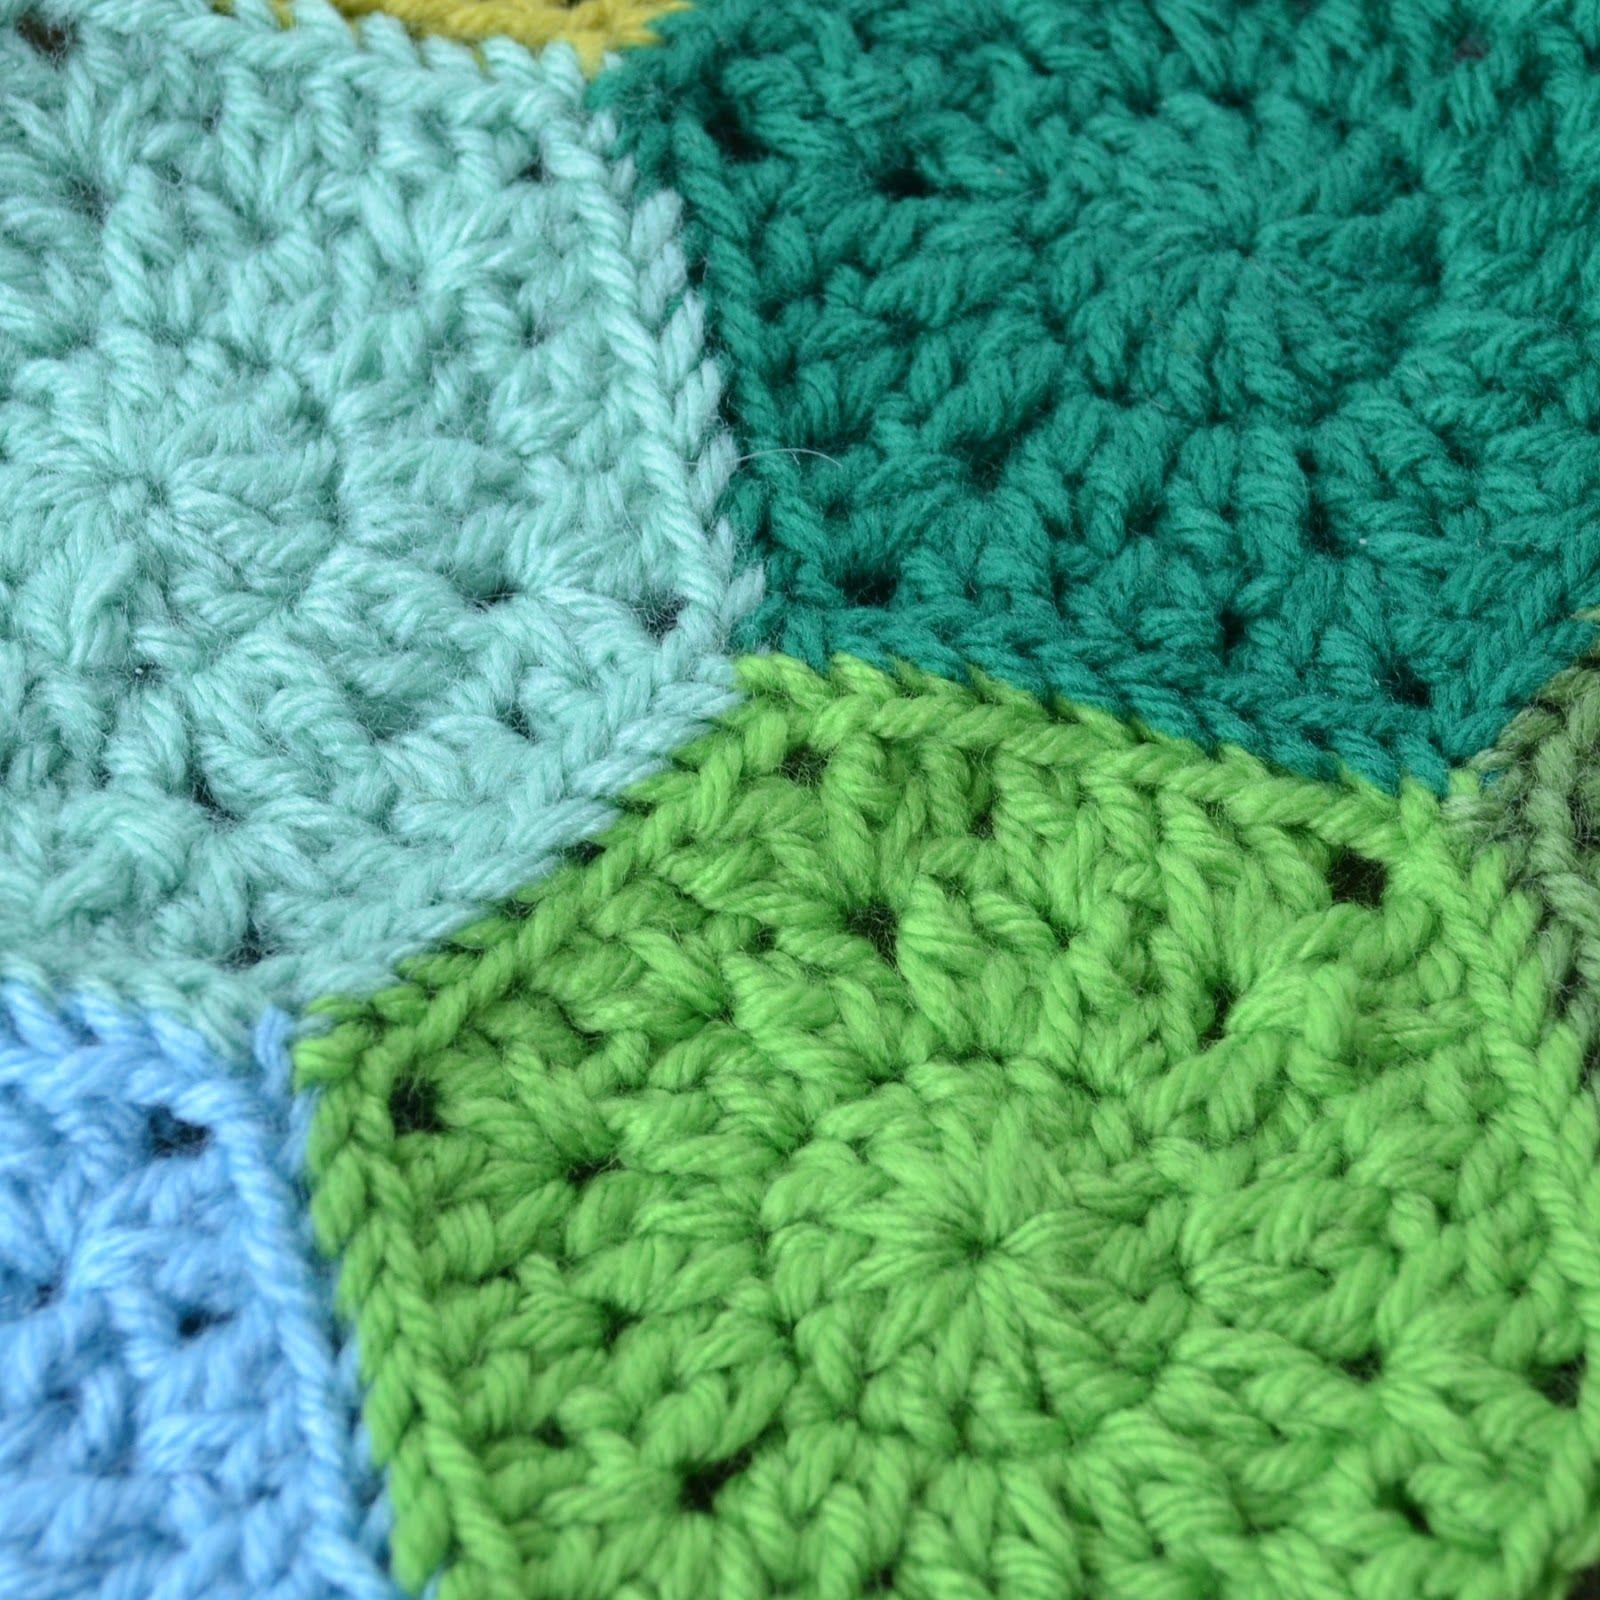 Crochet in Color: Hexagon Pattern | Hecagonos | Pinterest ...